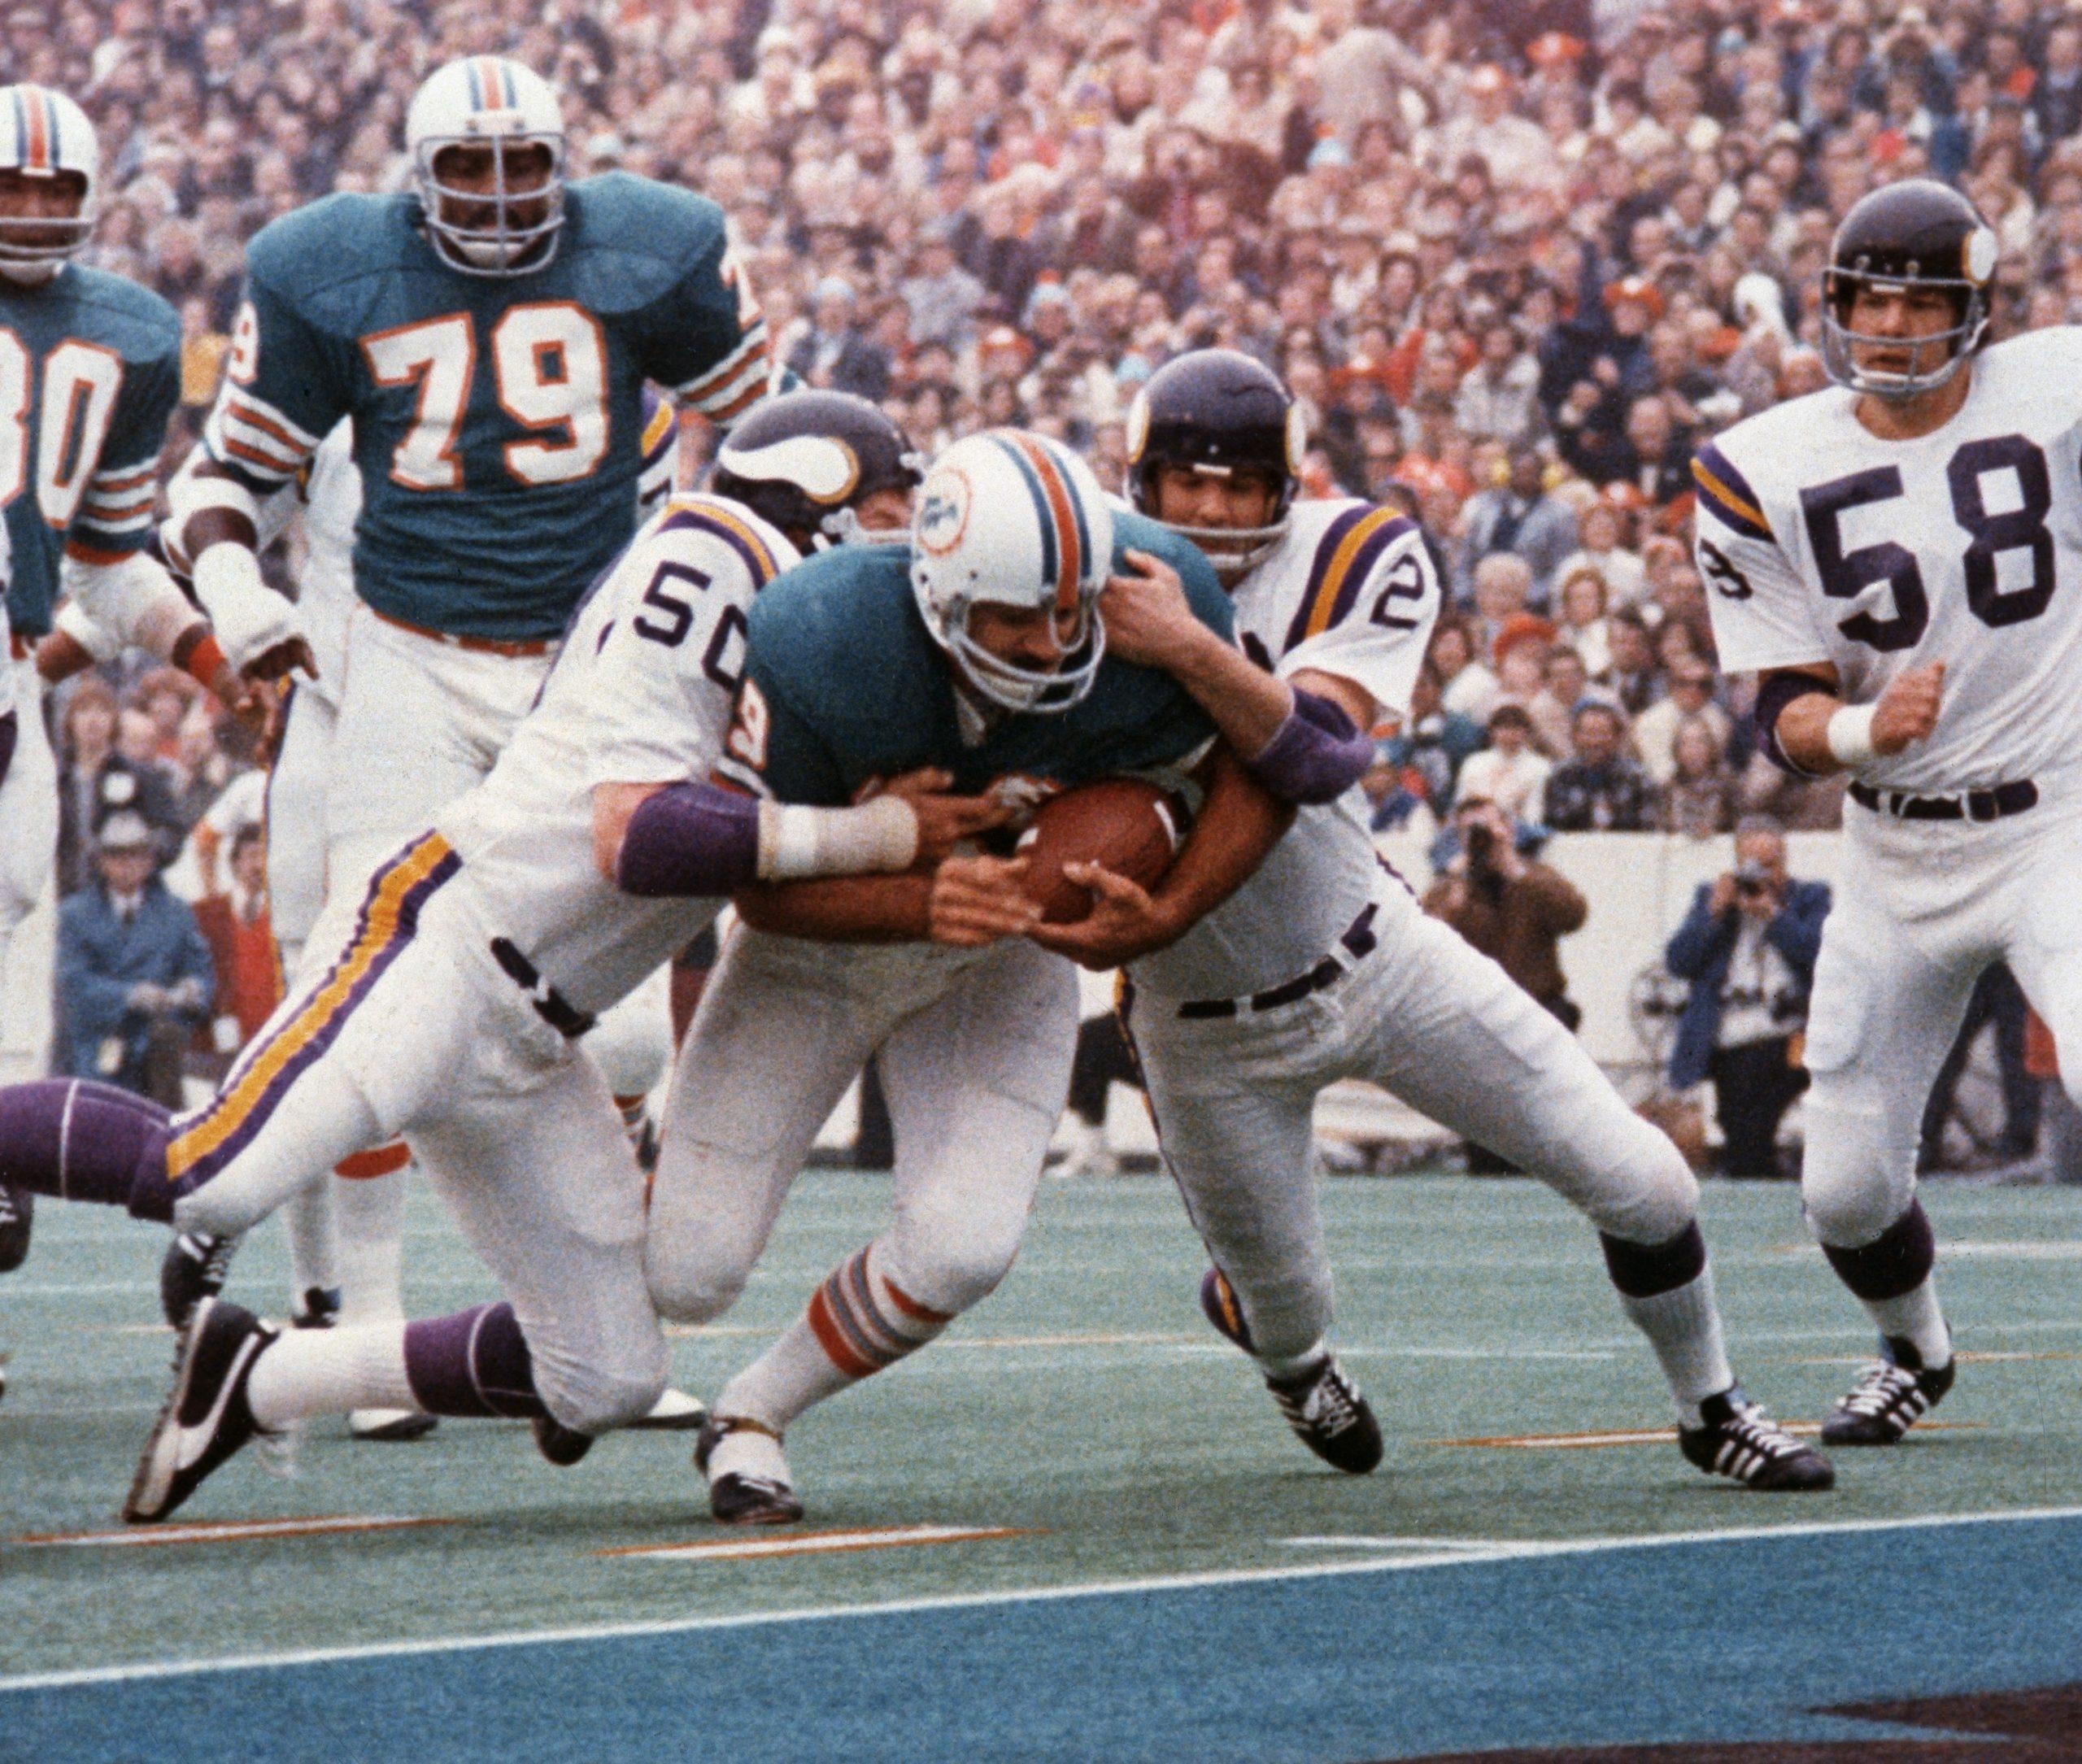 Super Bowl Viii: Vikings Have Fran Tarkenton, But Dolphins regarding Miami Dolphins Super Bowl History